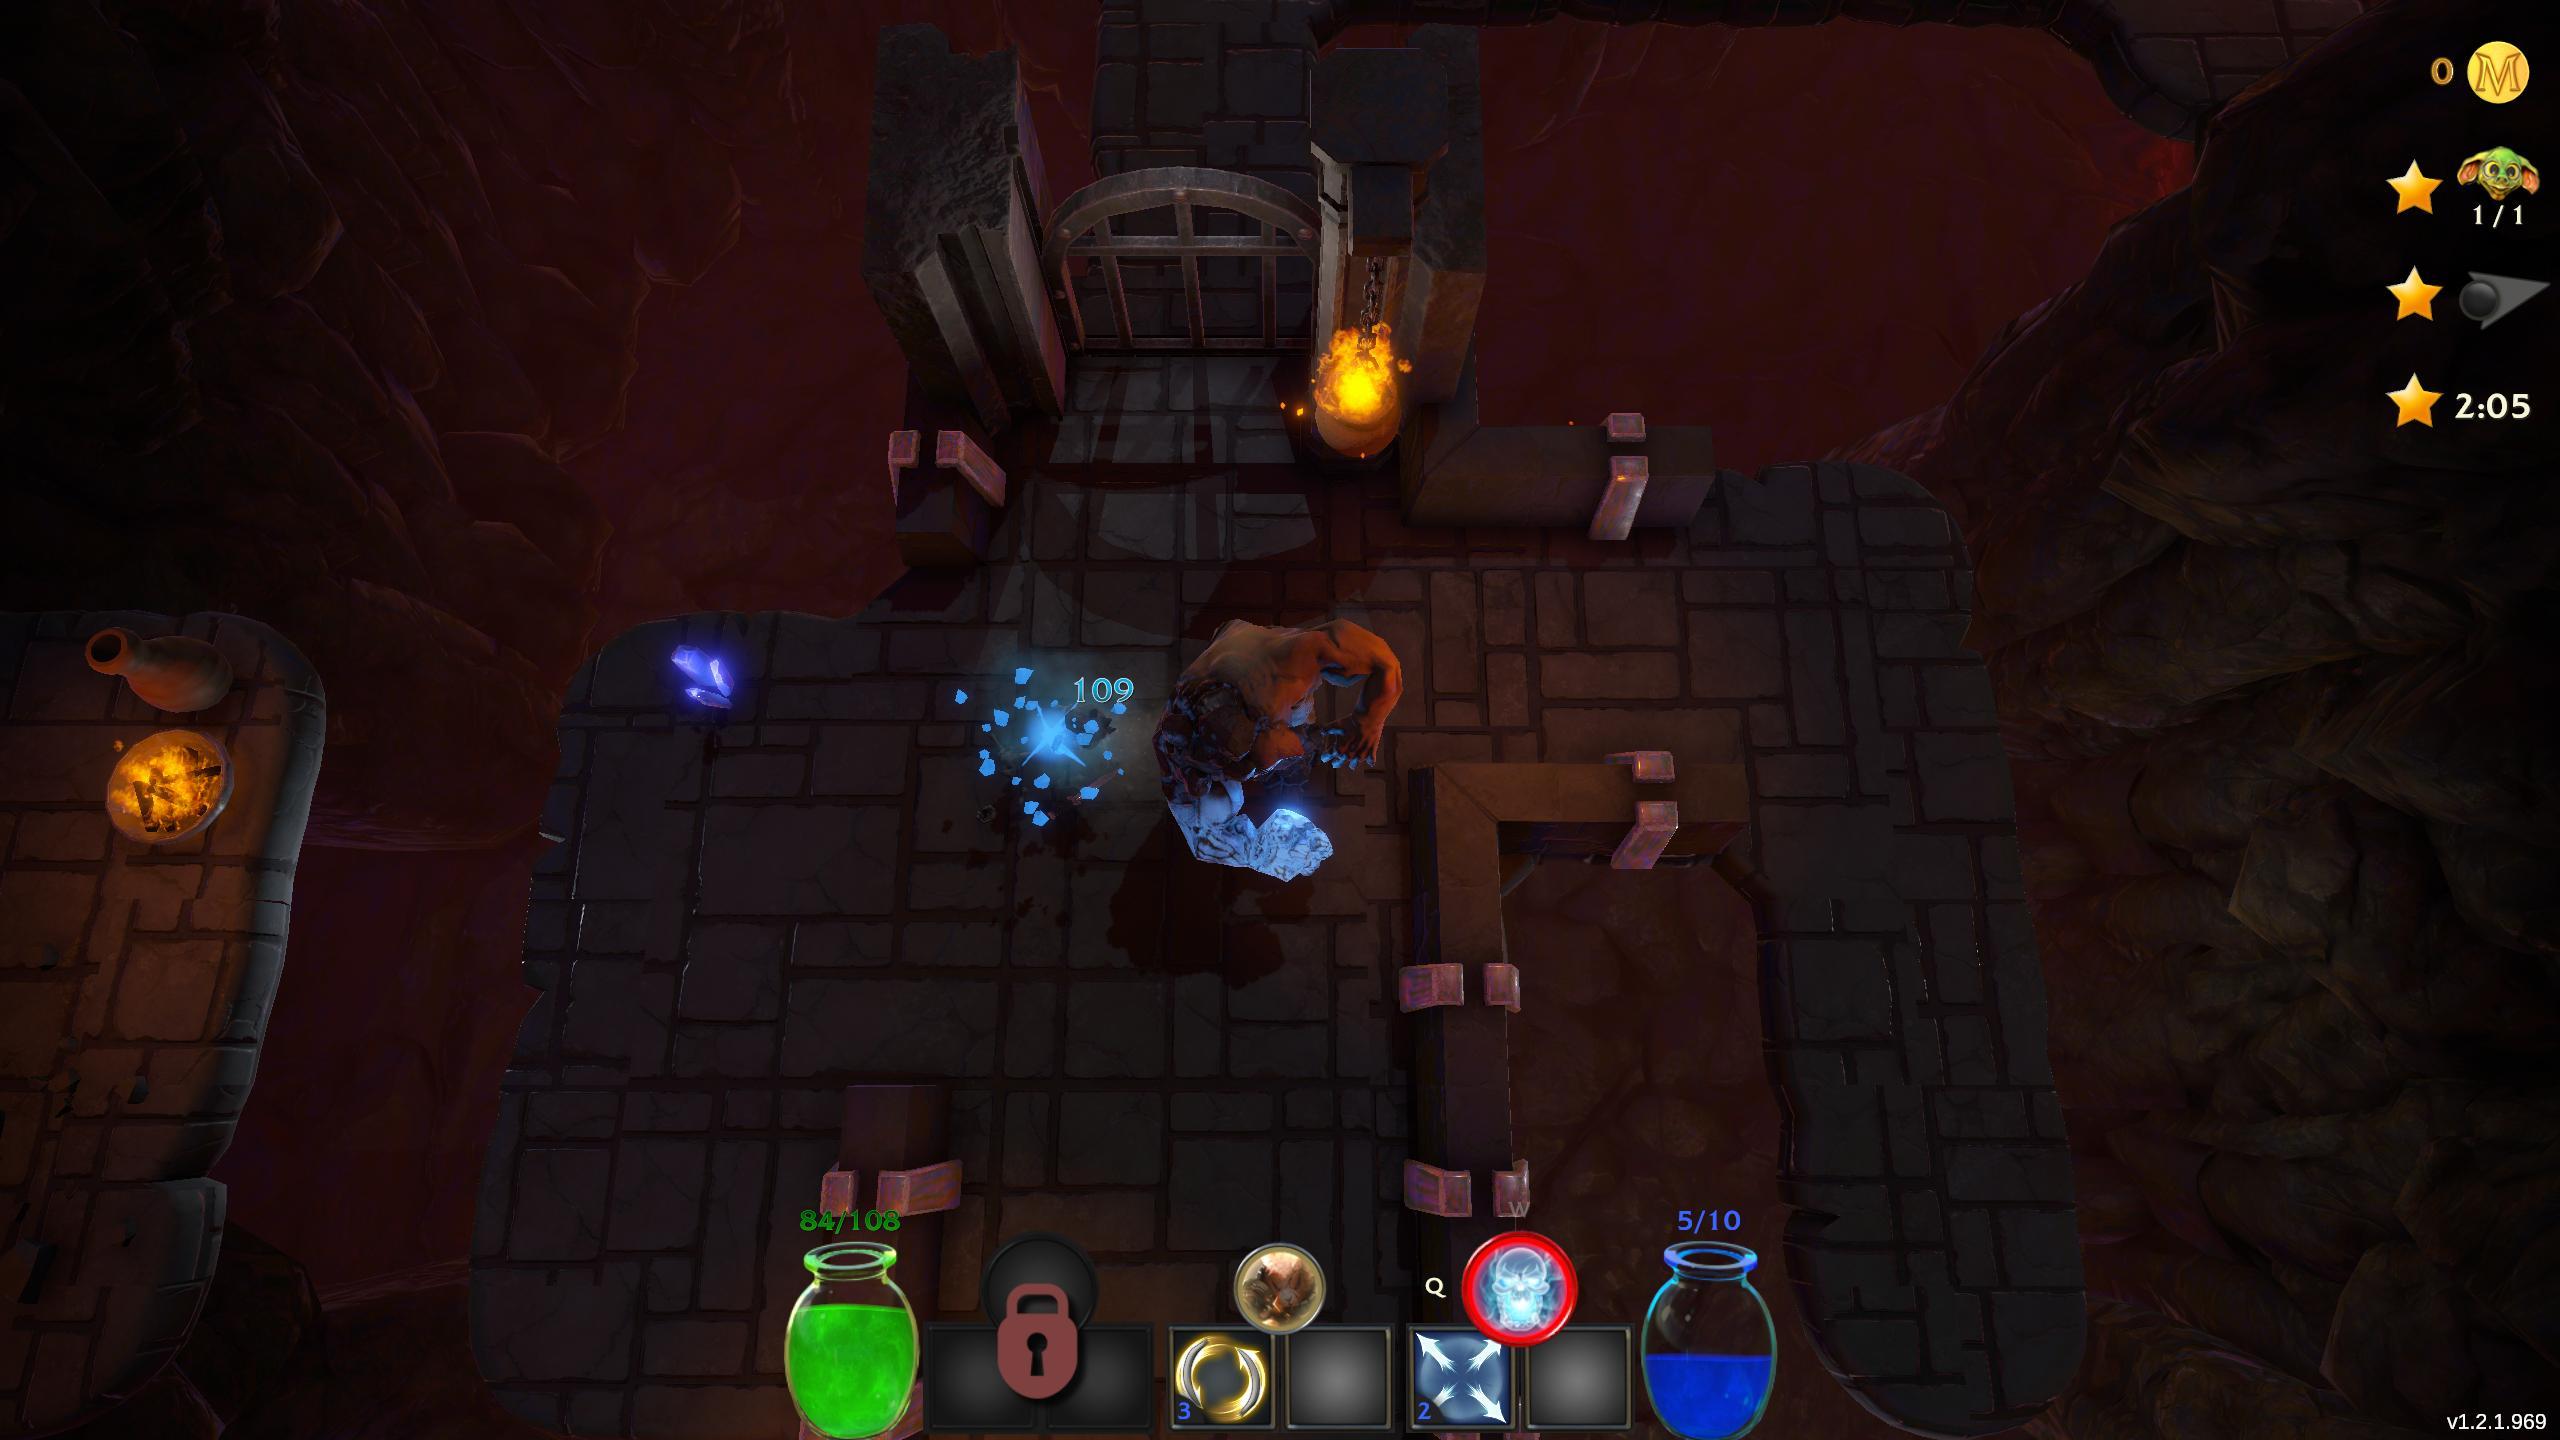 Скриншоты к MetaMorph: Dungeon Creatures v1.2.0.969